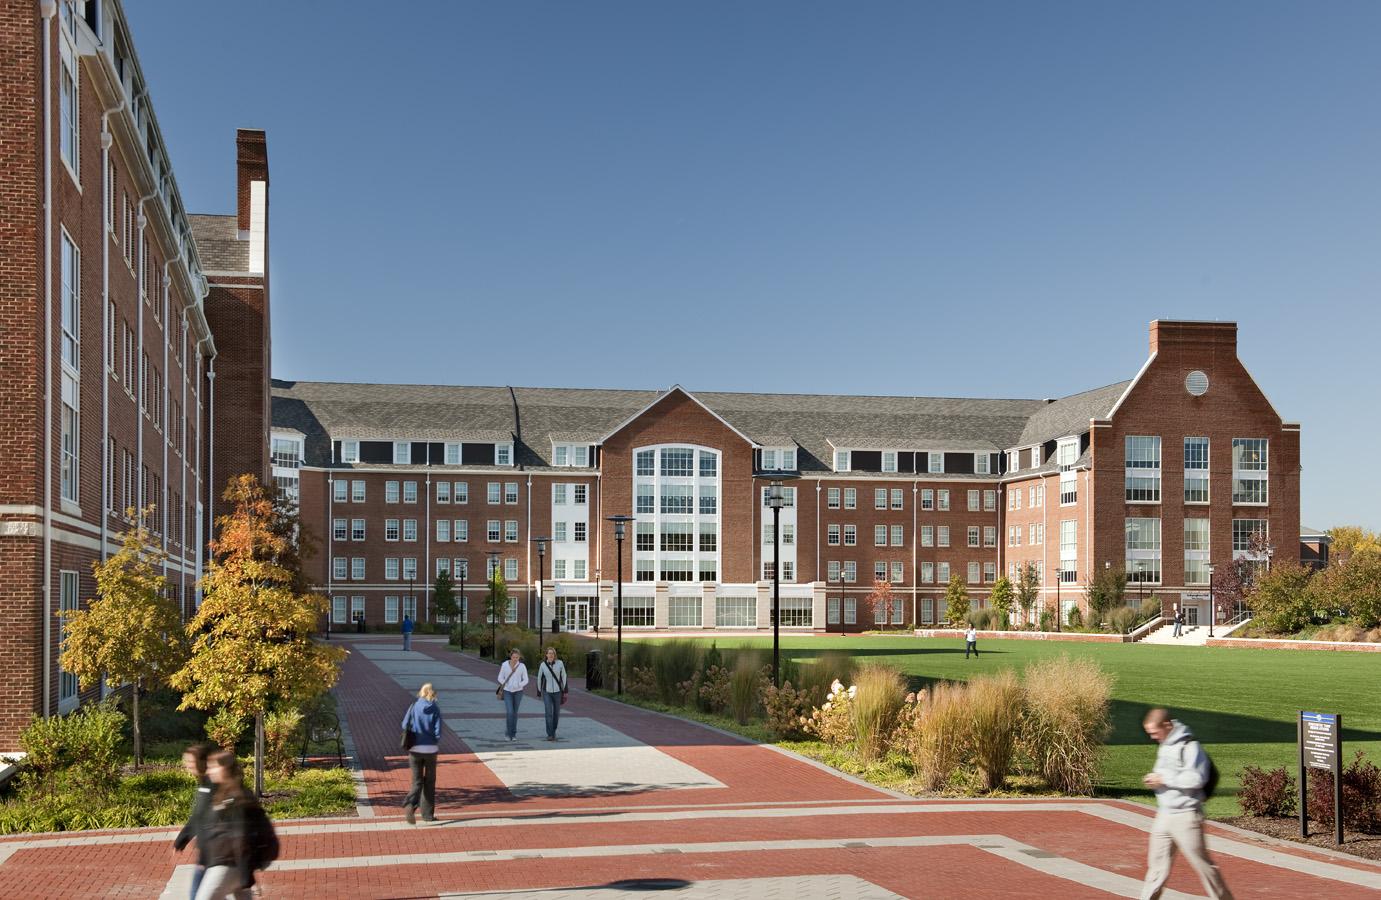 Johns Hopkins Dorms University